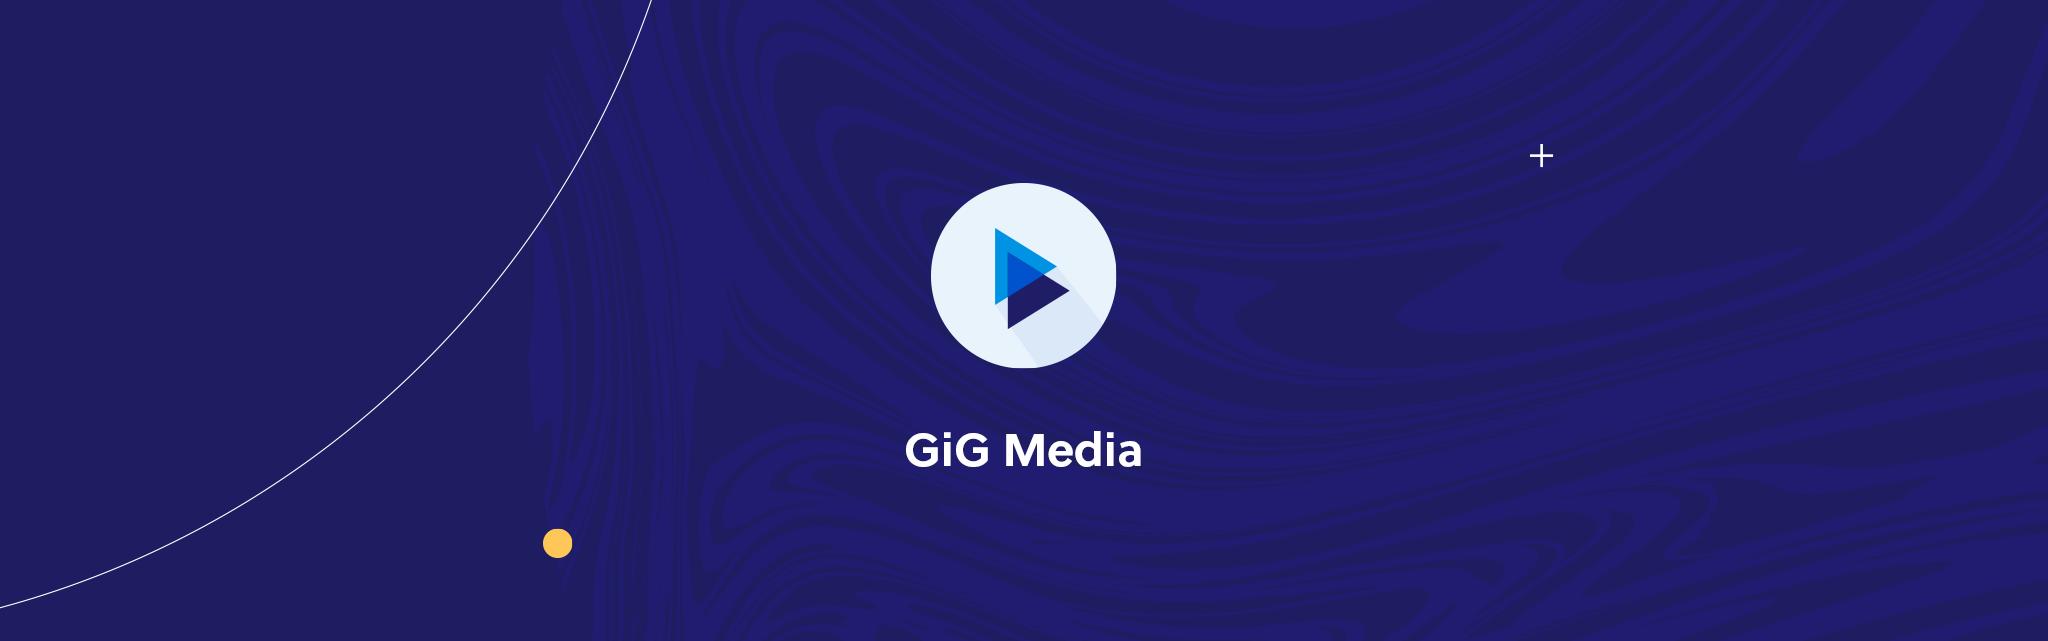 GiG Media Power Affiliates